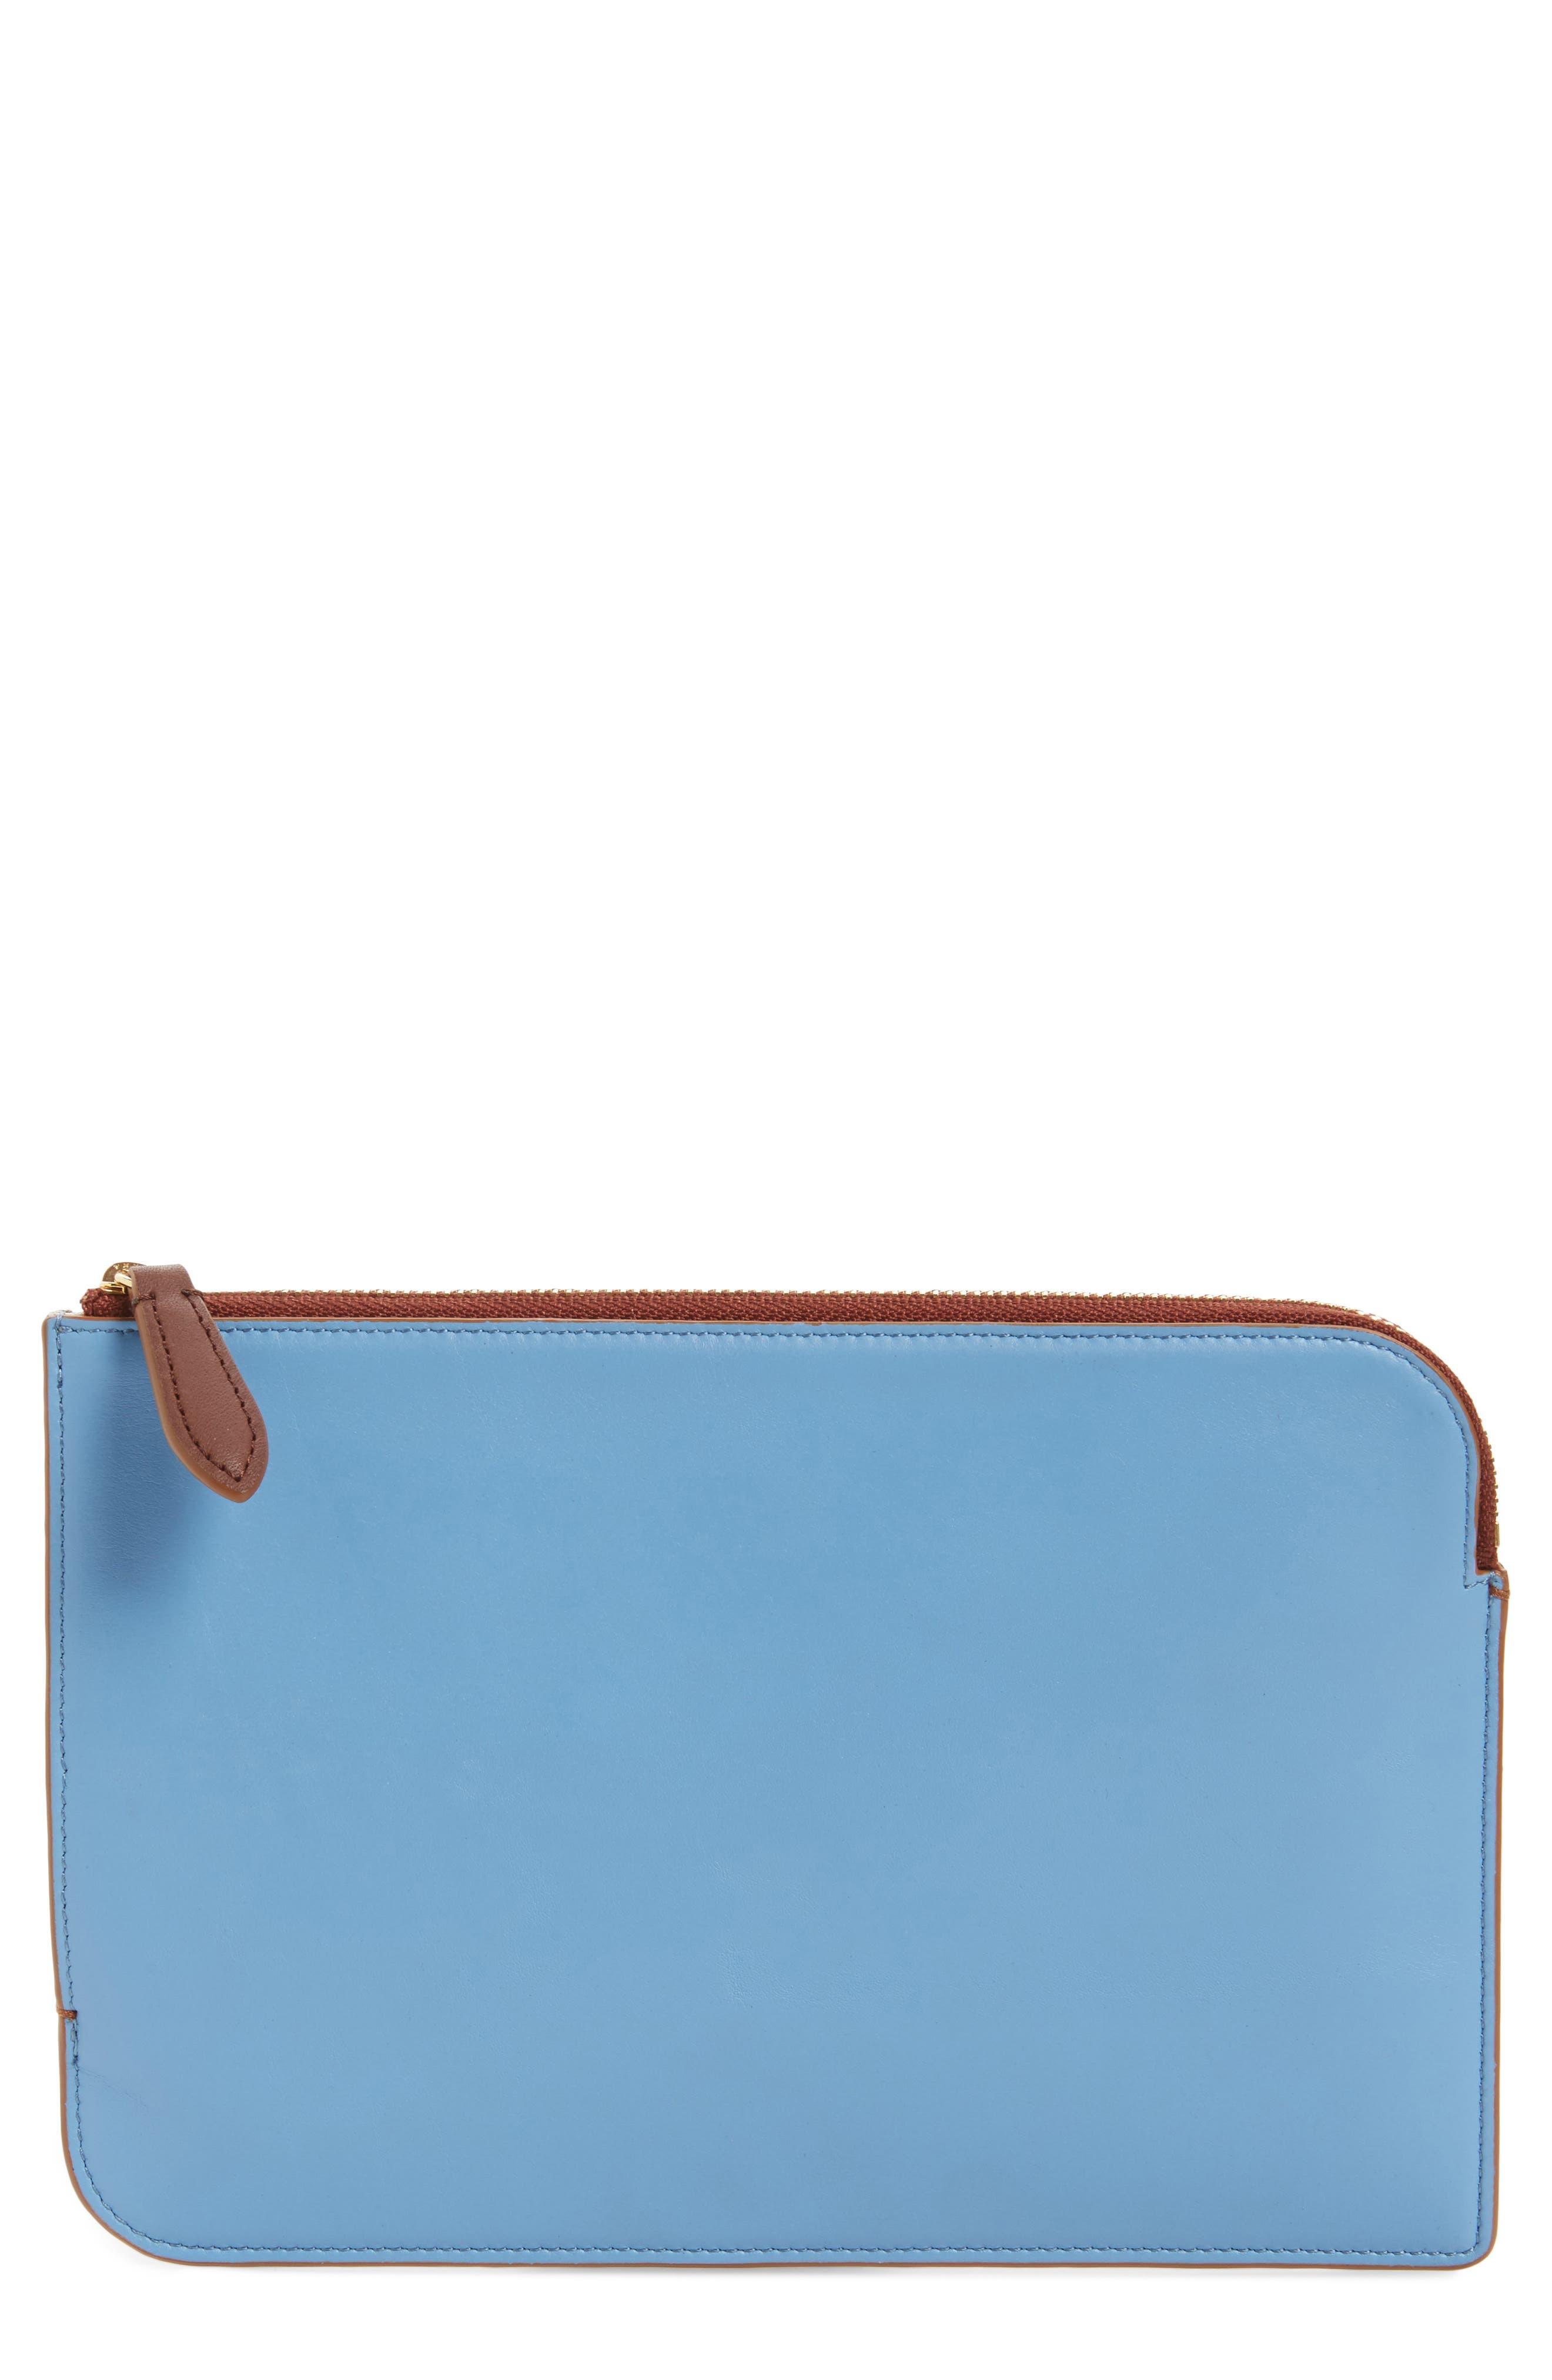 Medium Leather Zip Pouch,                         Main,                         color, 455